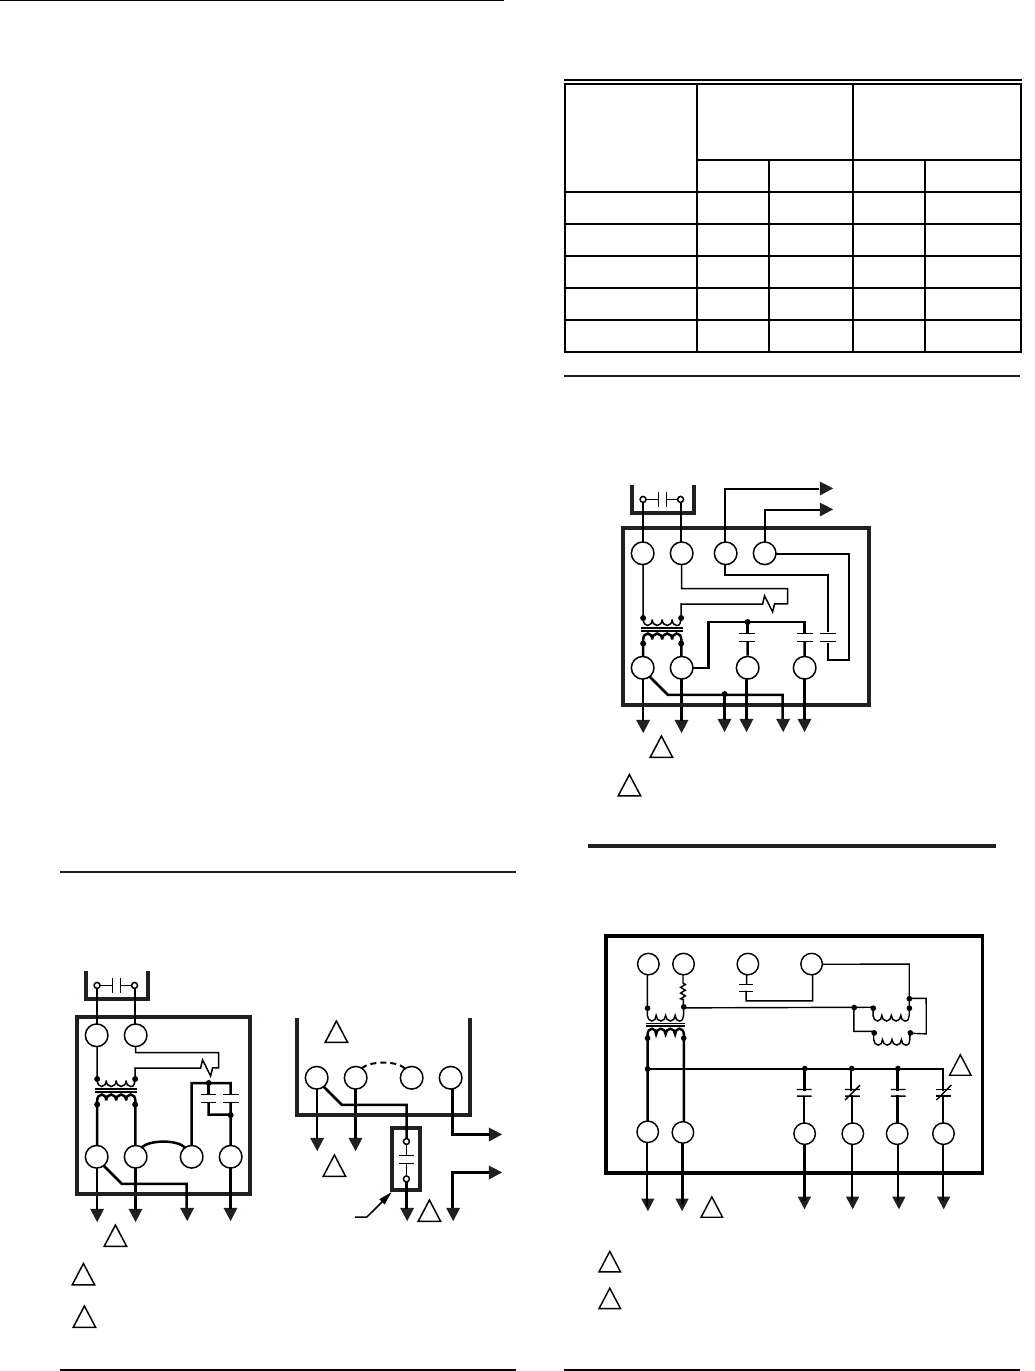 Honeywell Switch R182J Users Manual 60 2481 R182J, R482J